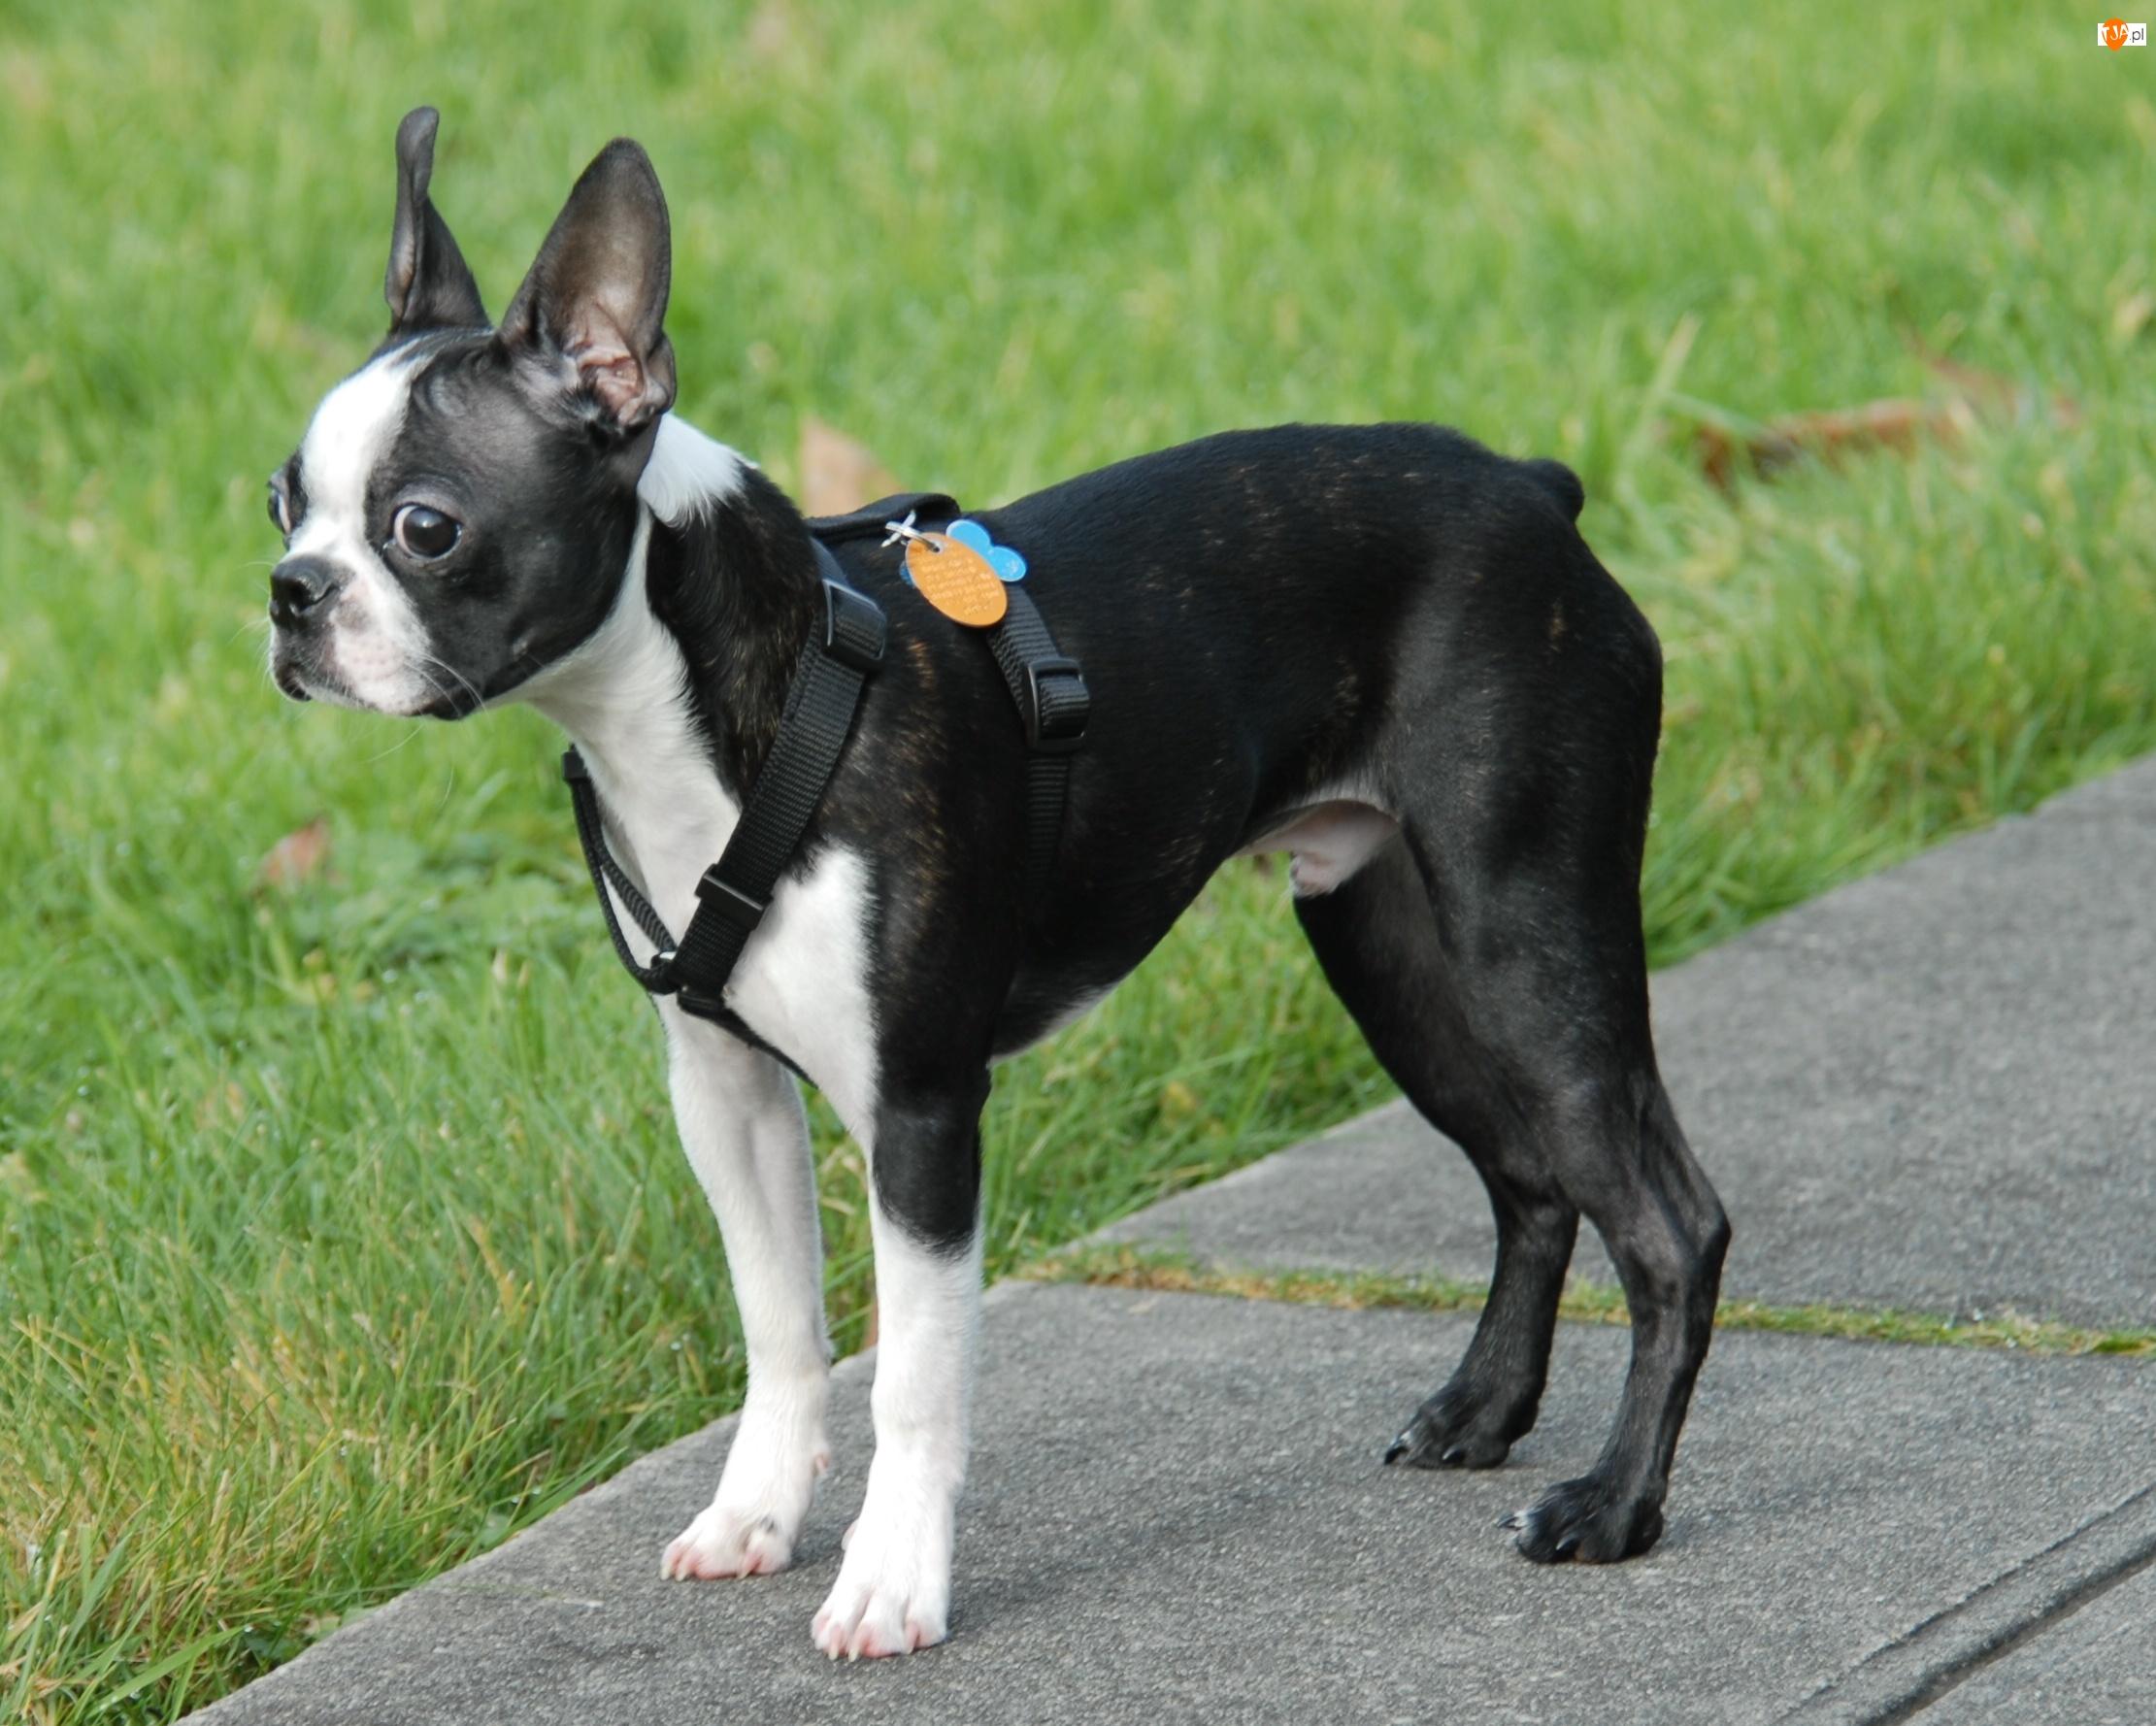 Trawa, Boston terrier, Chodnik